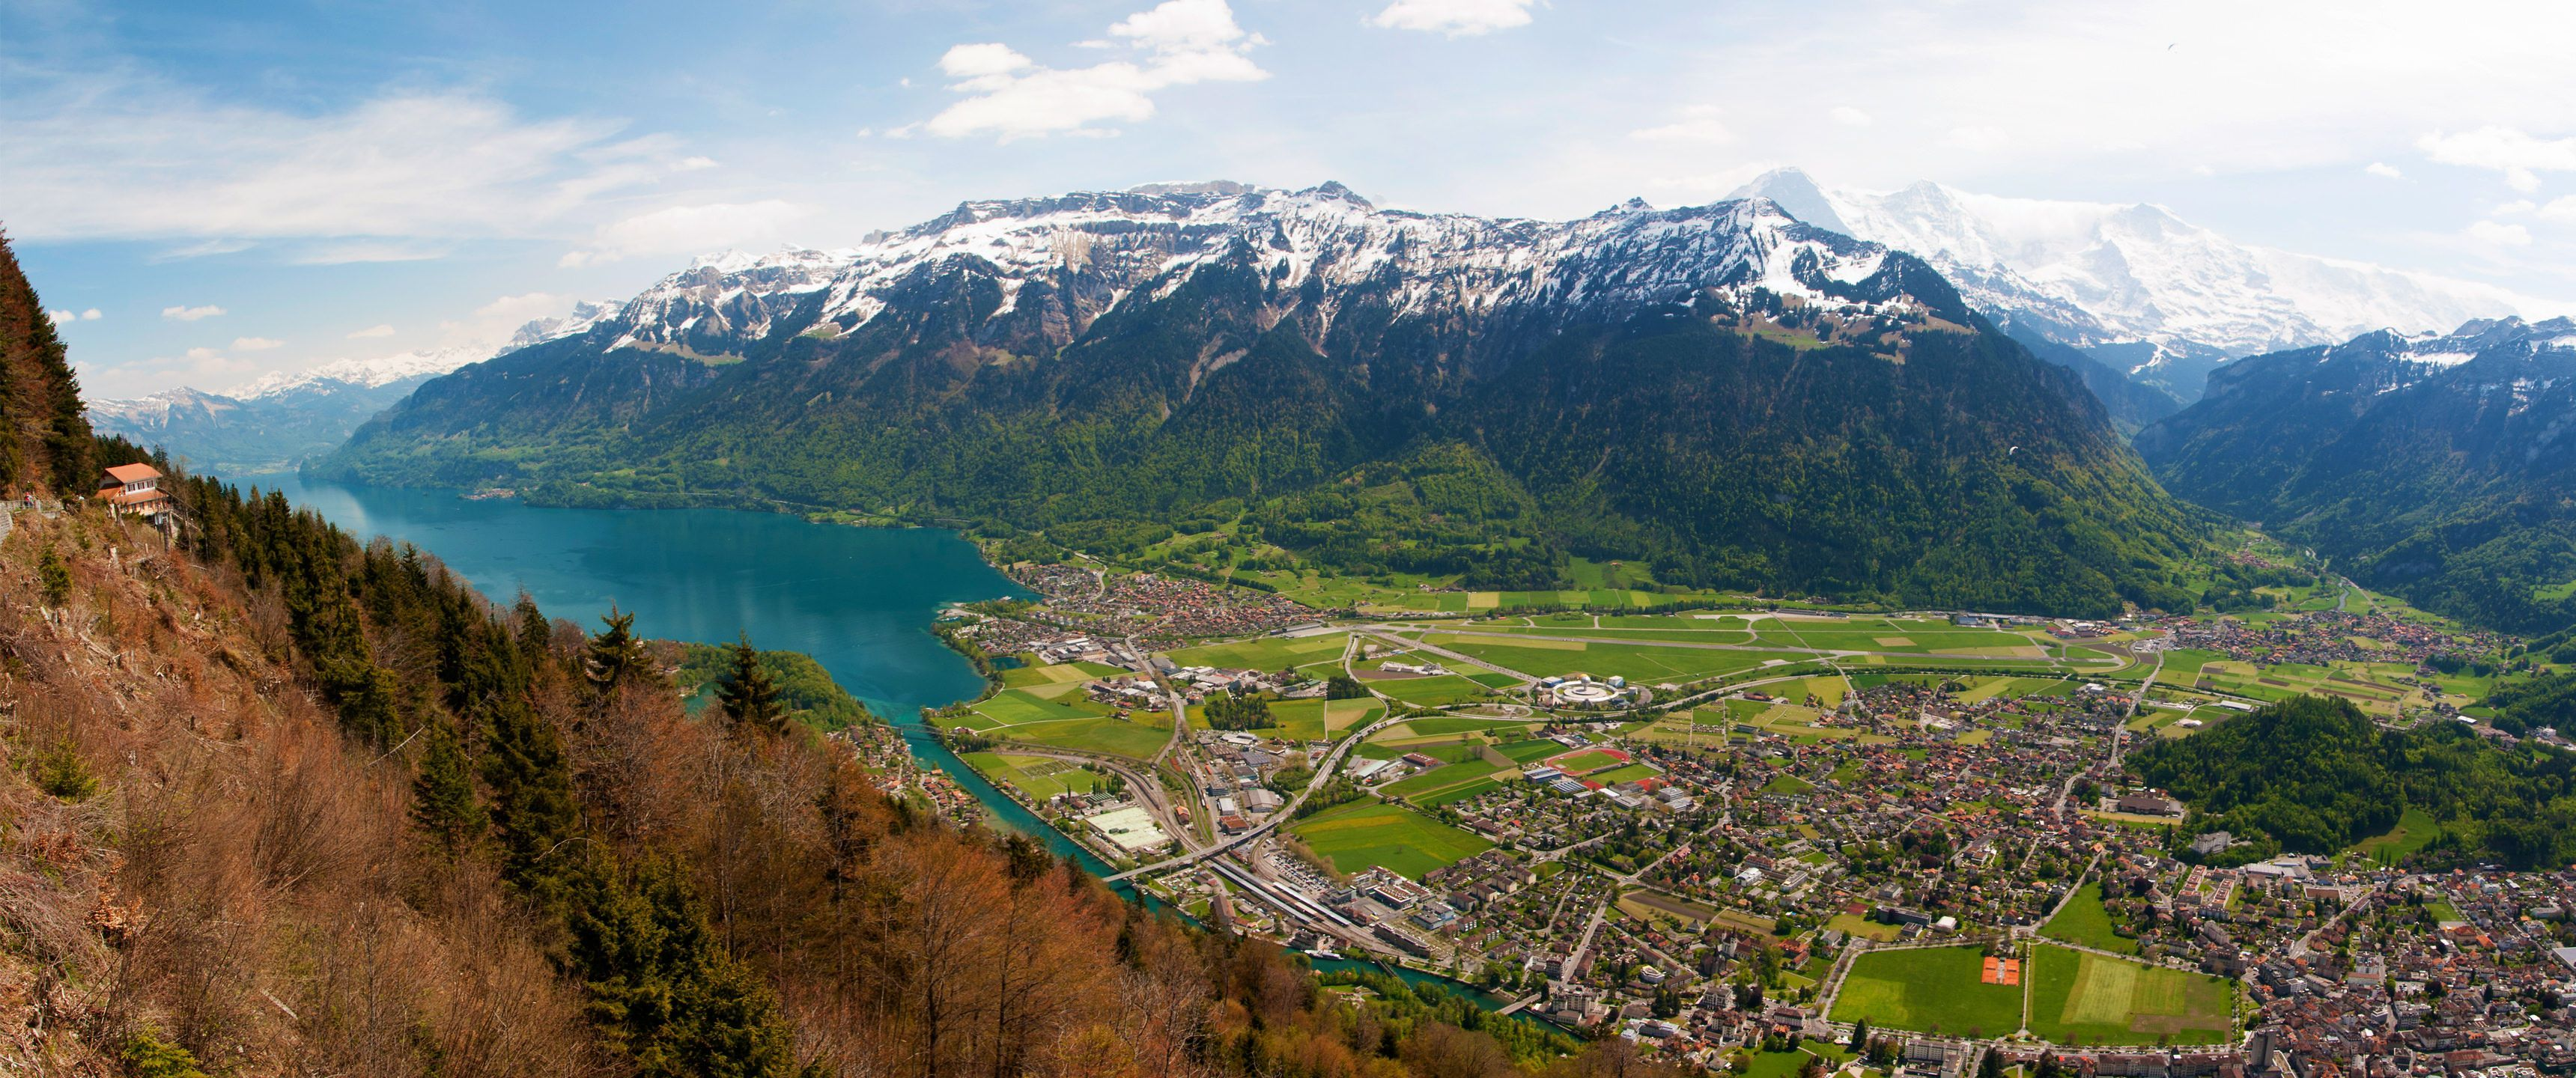 Landscape Wallpaper Reddit Elegant Interlaken Switzerland [3440 3440x1440